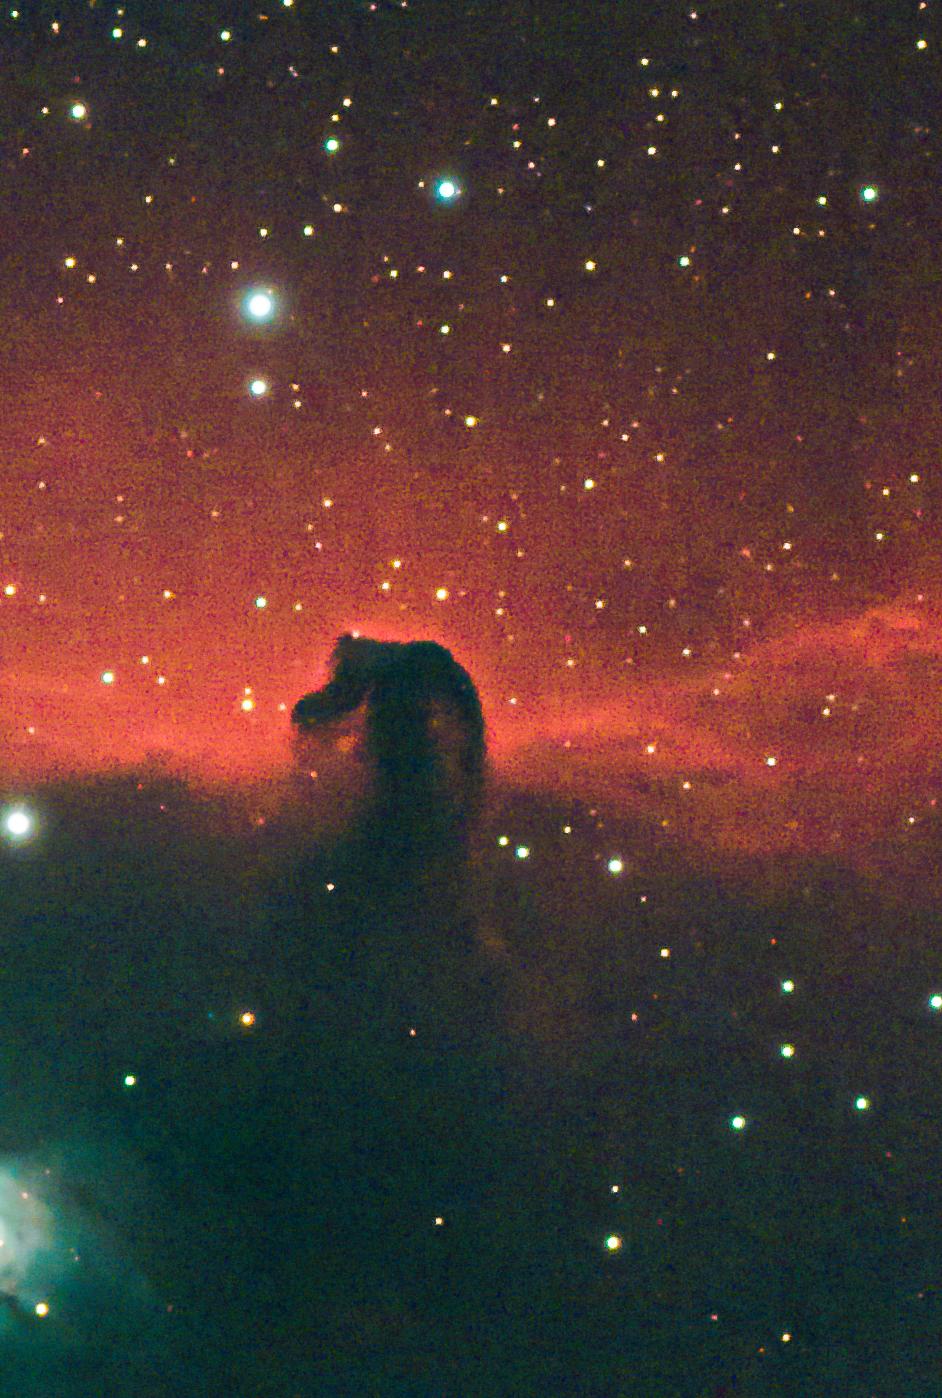 ic434, barnard 33, horsehead, horsehead nebula, orion,